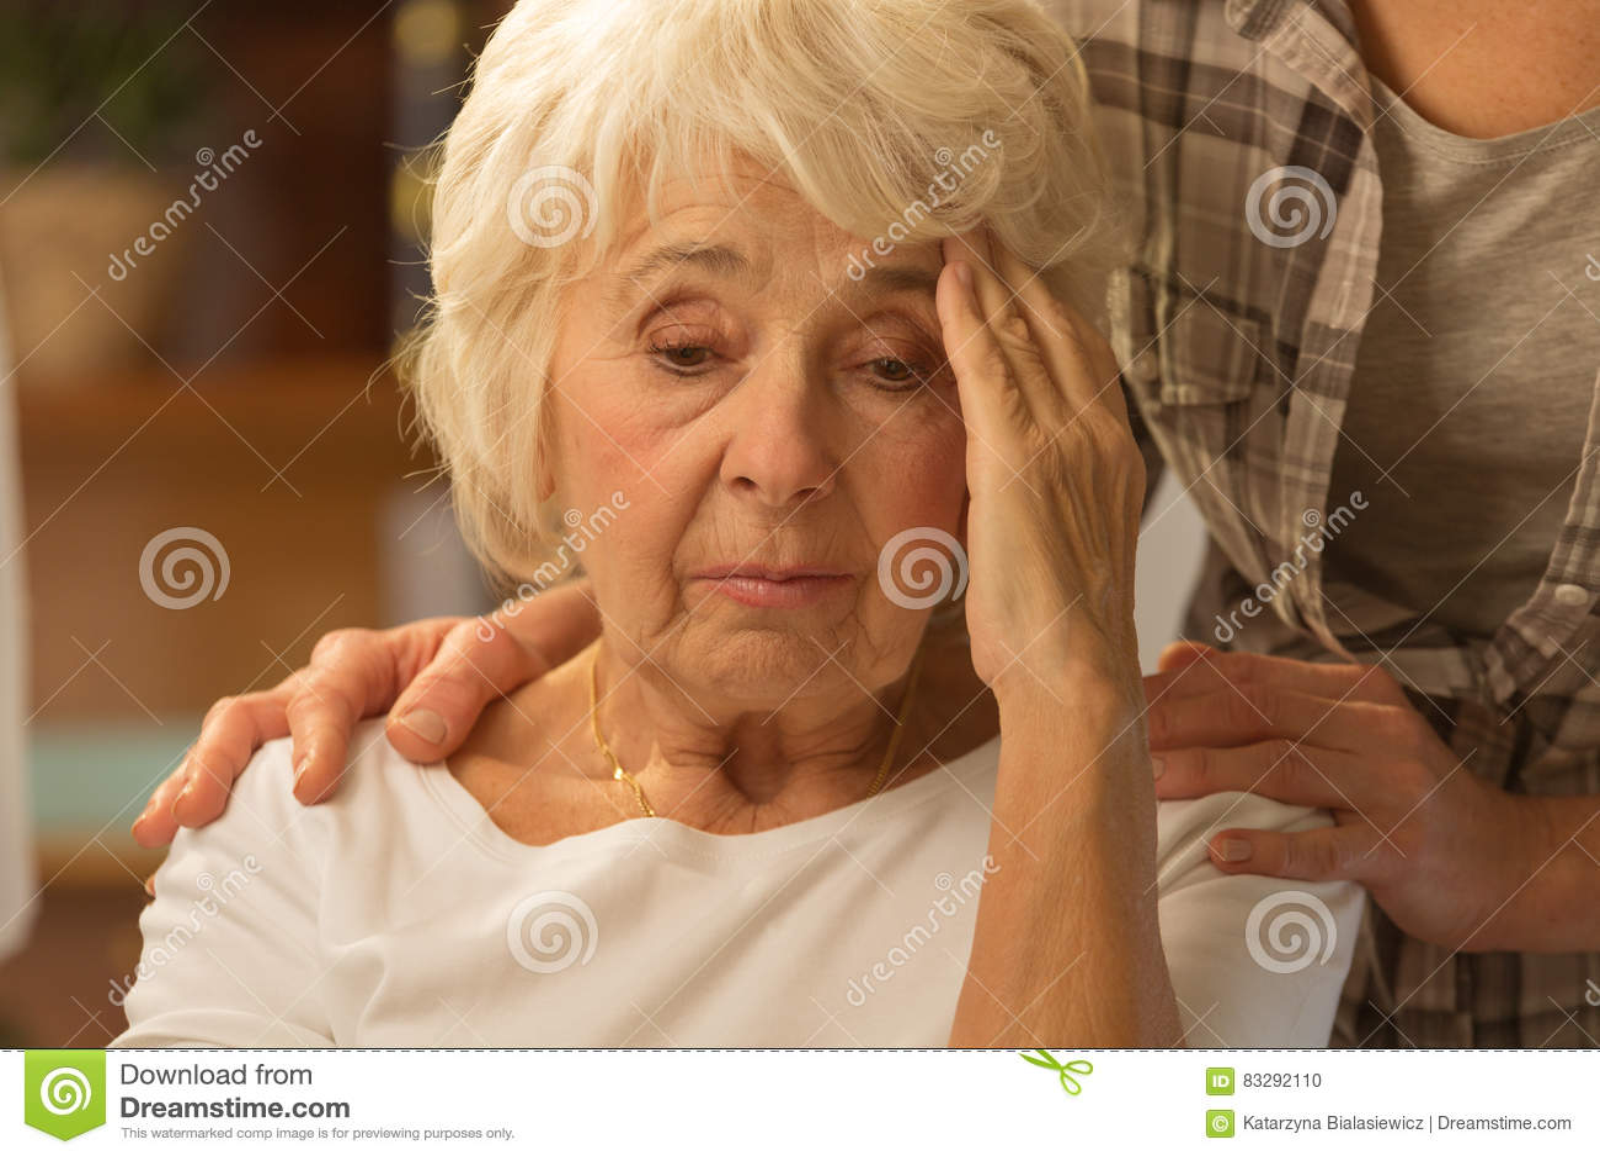 Senior woman feeling discomfort